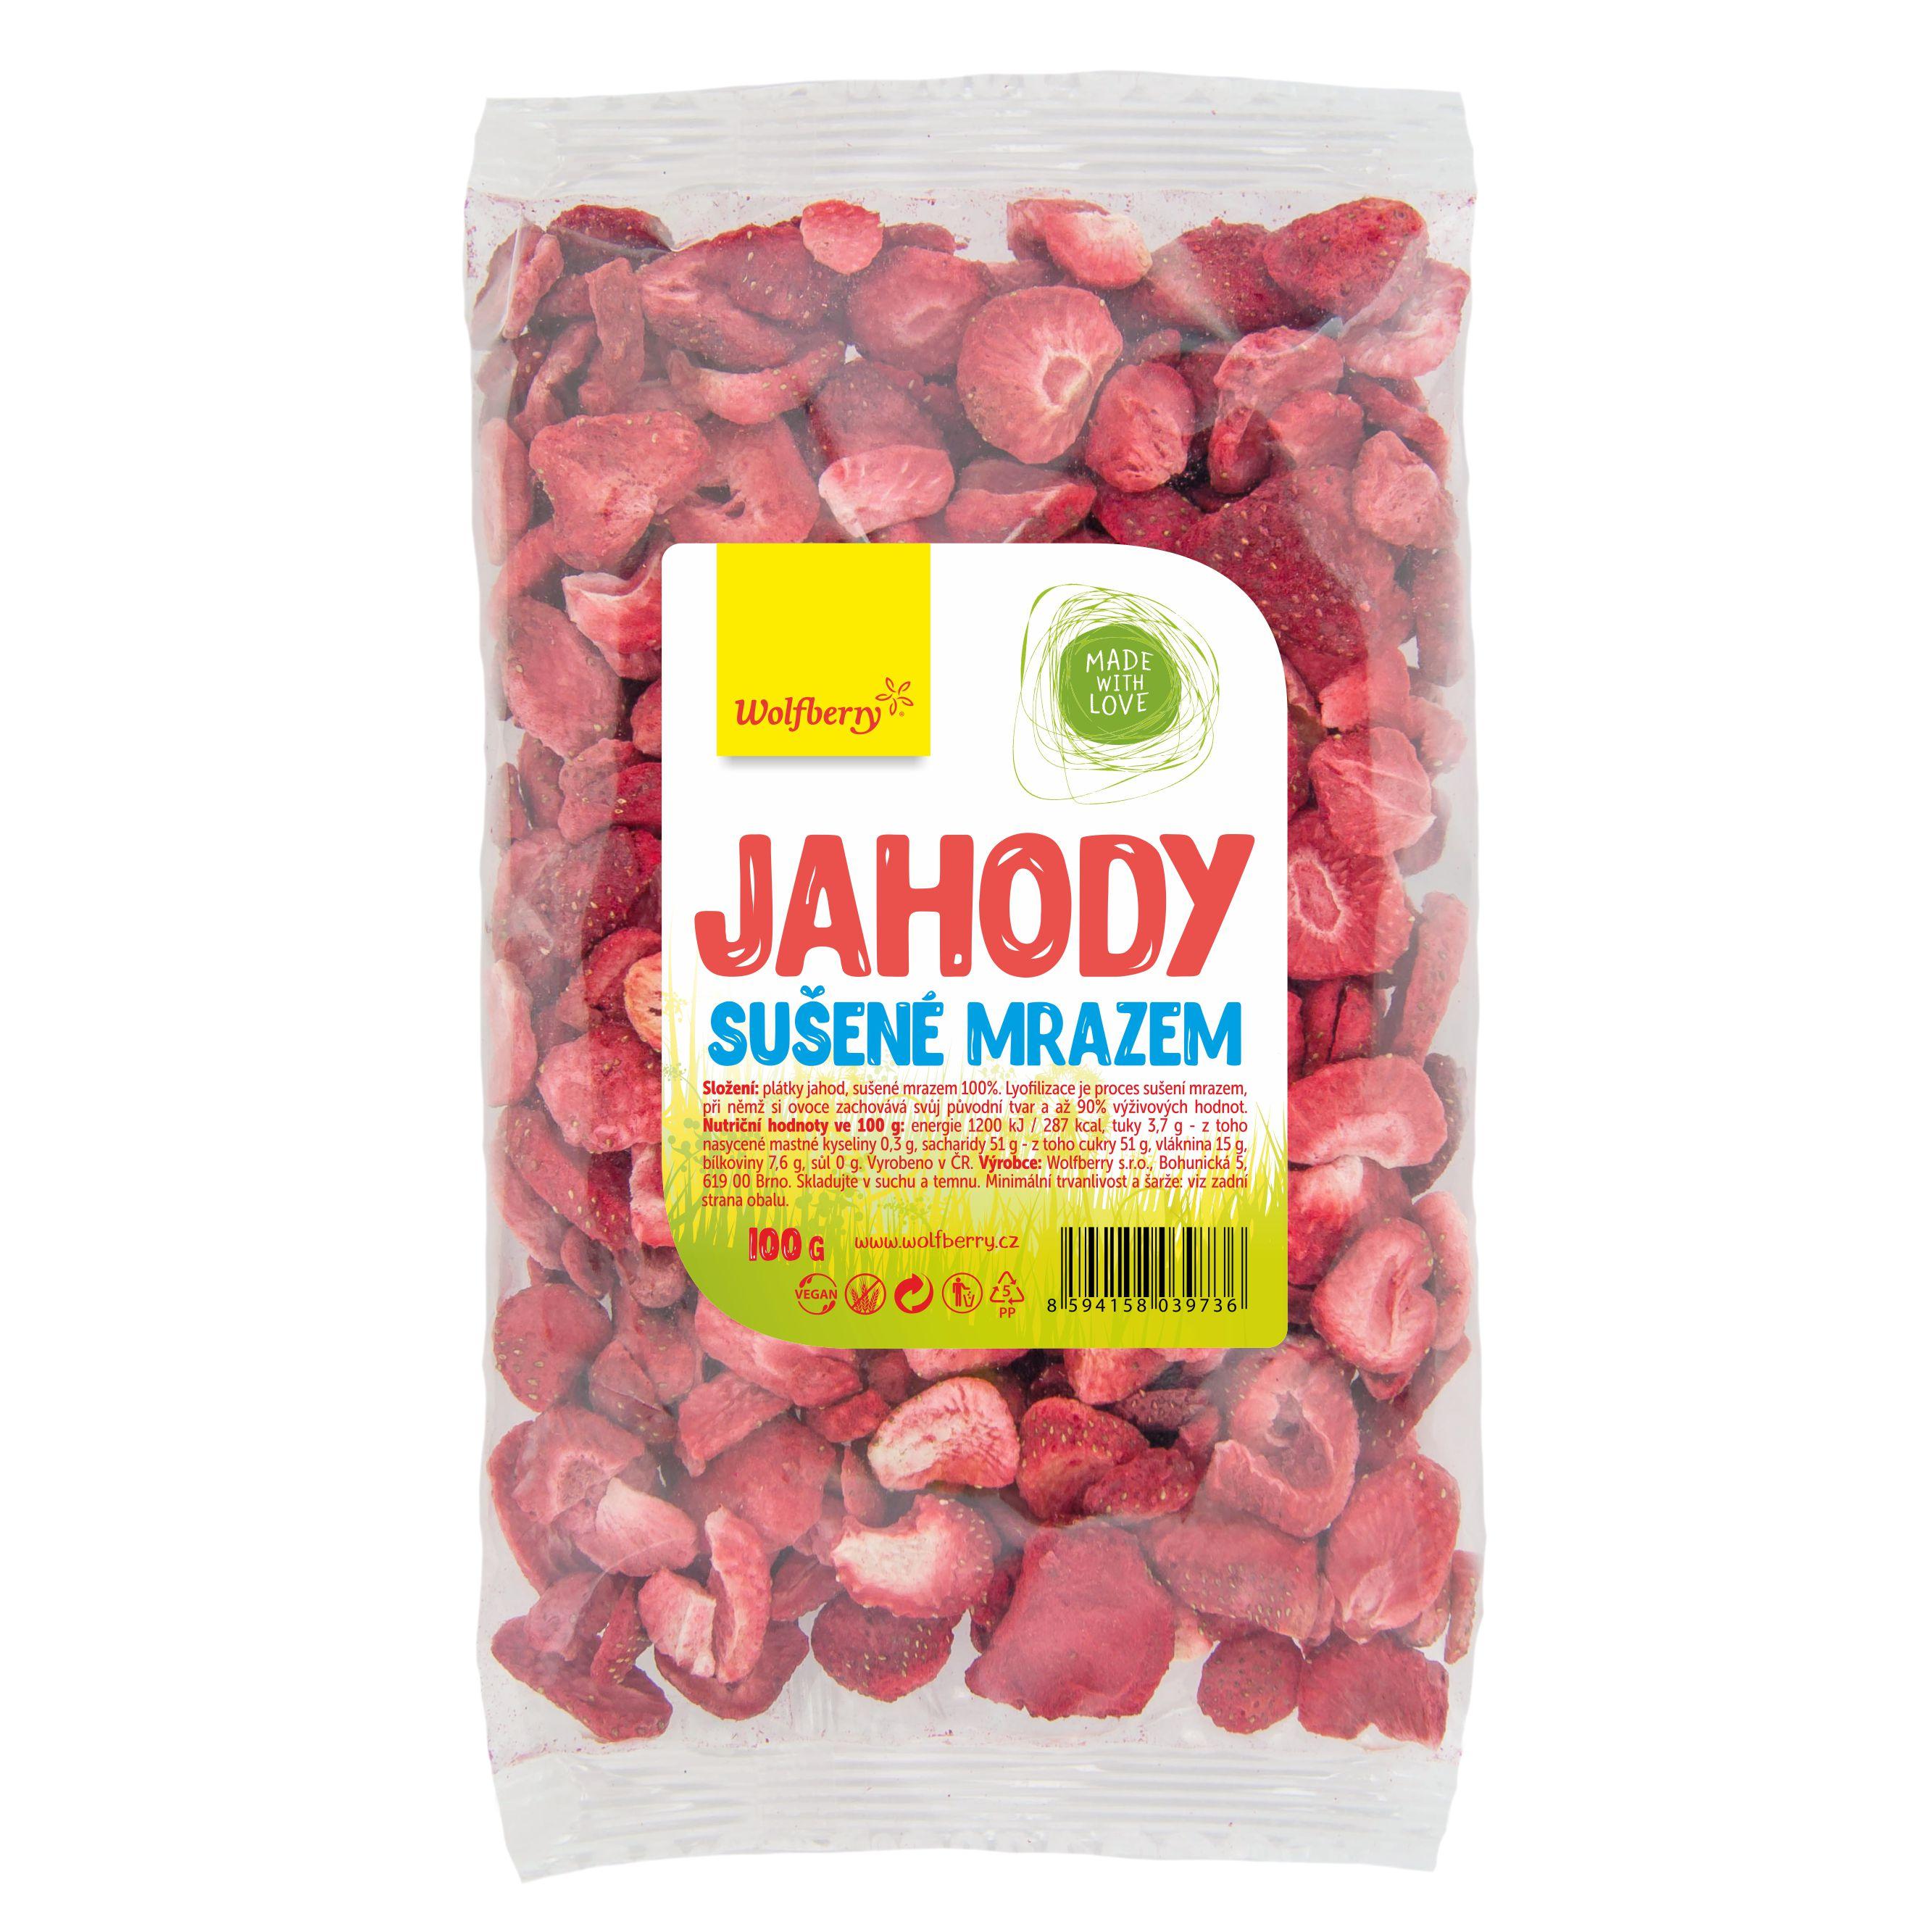 Wolfberry Jahody lyofilizované 100 g Wolfberry 100 g